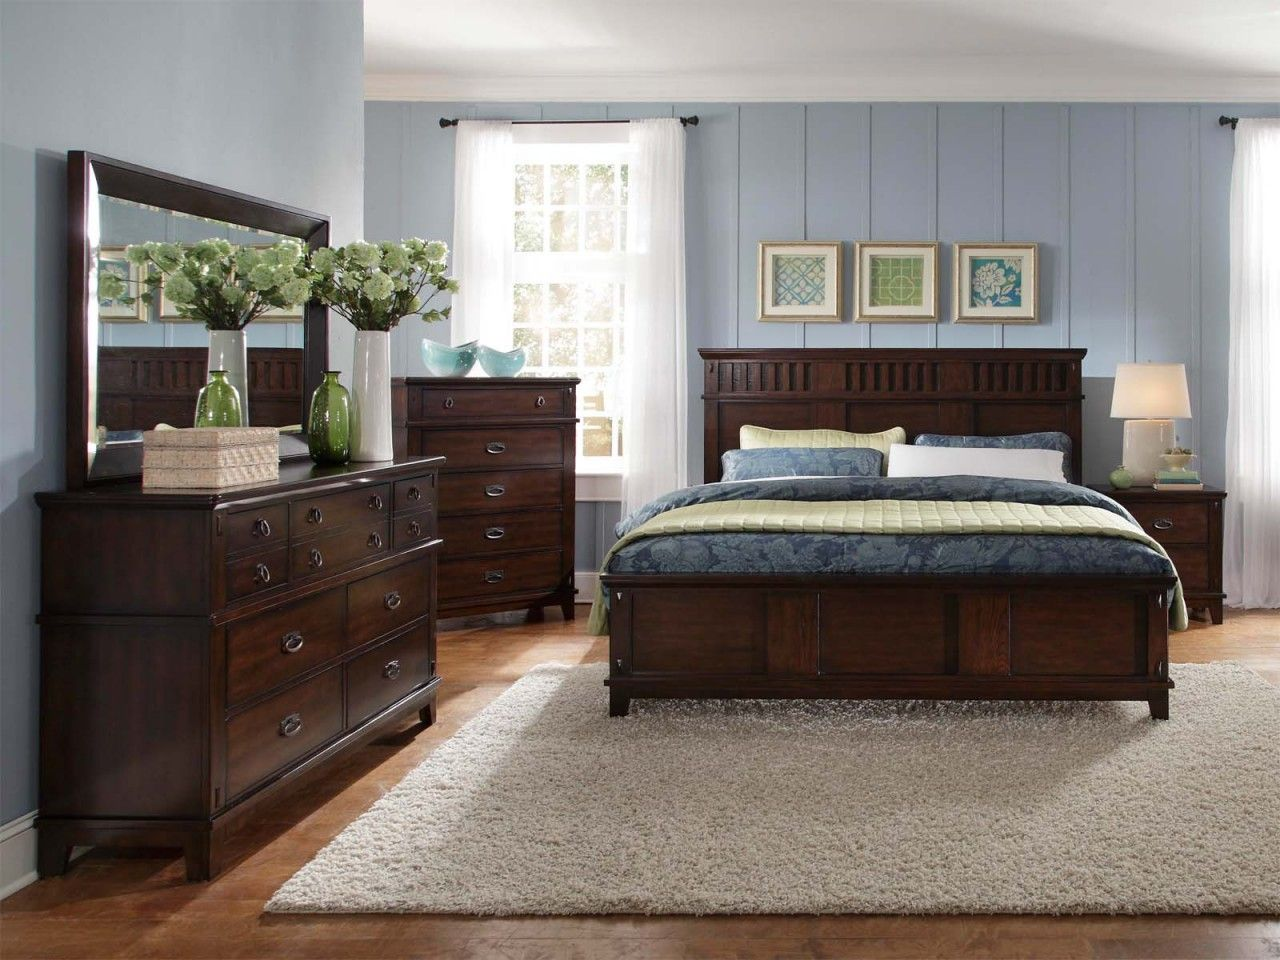 Bedroom Ideas With Dark Furniture Hawk Haven